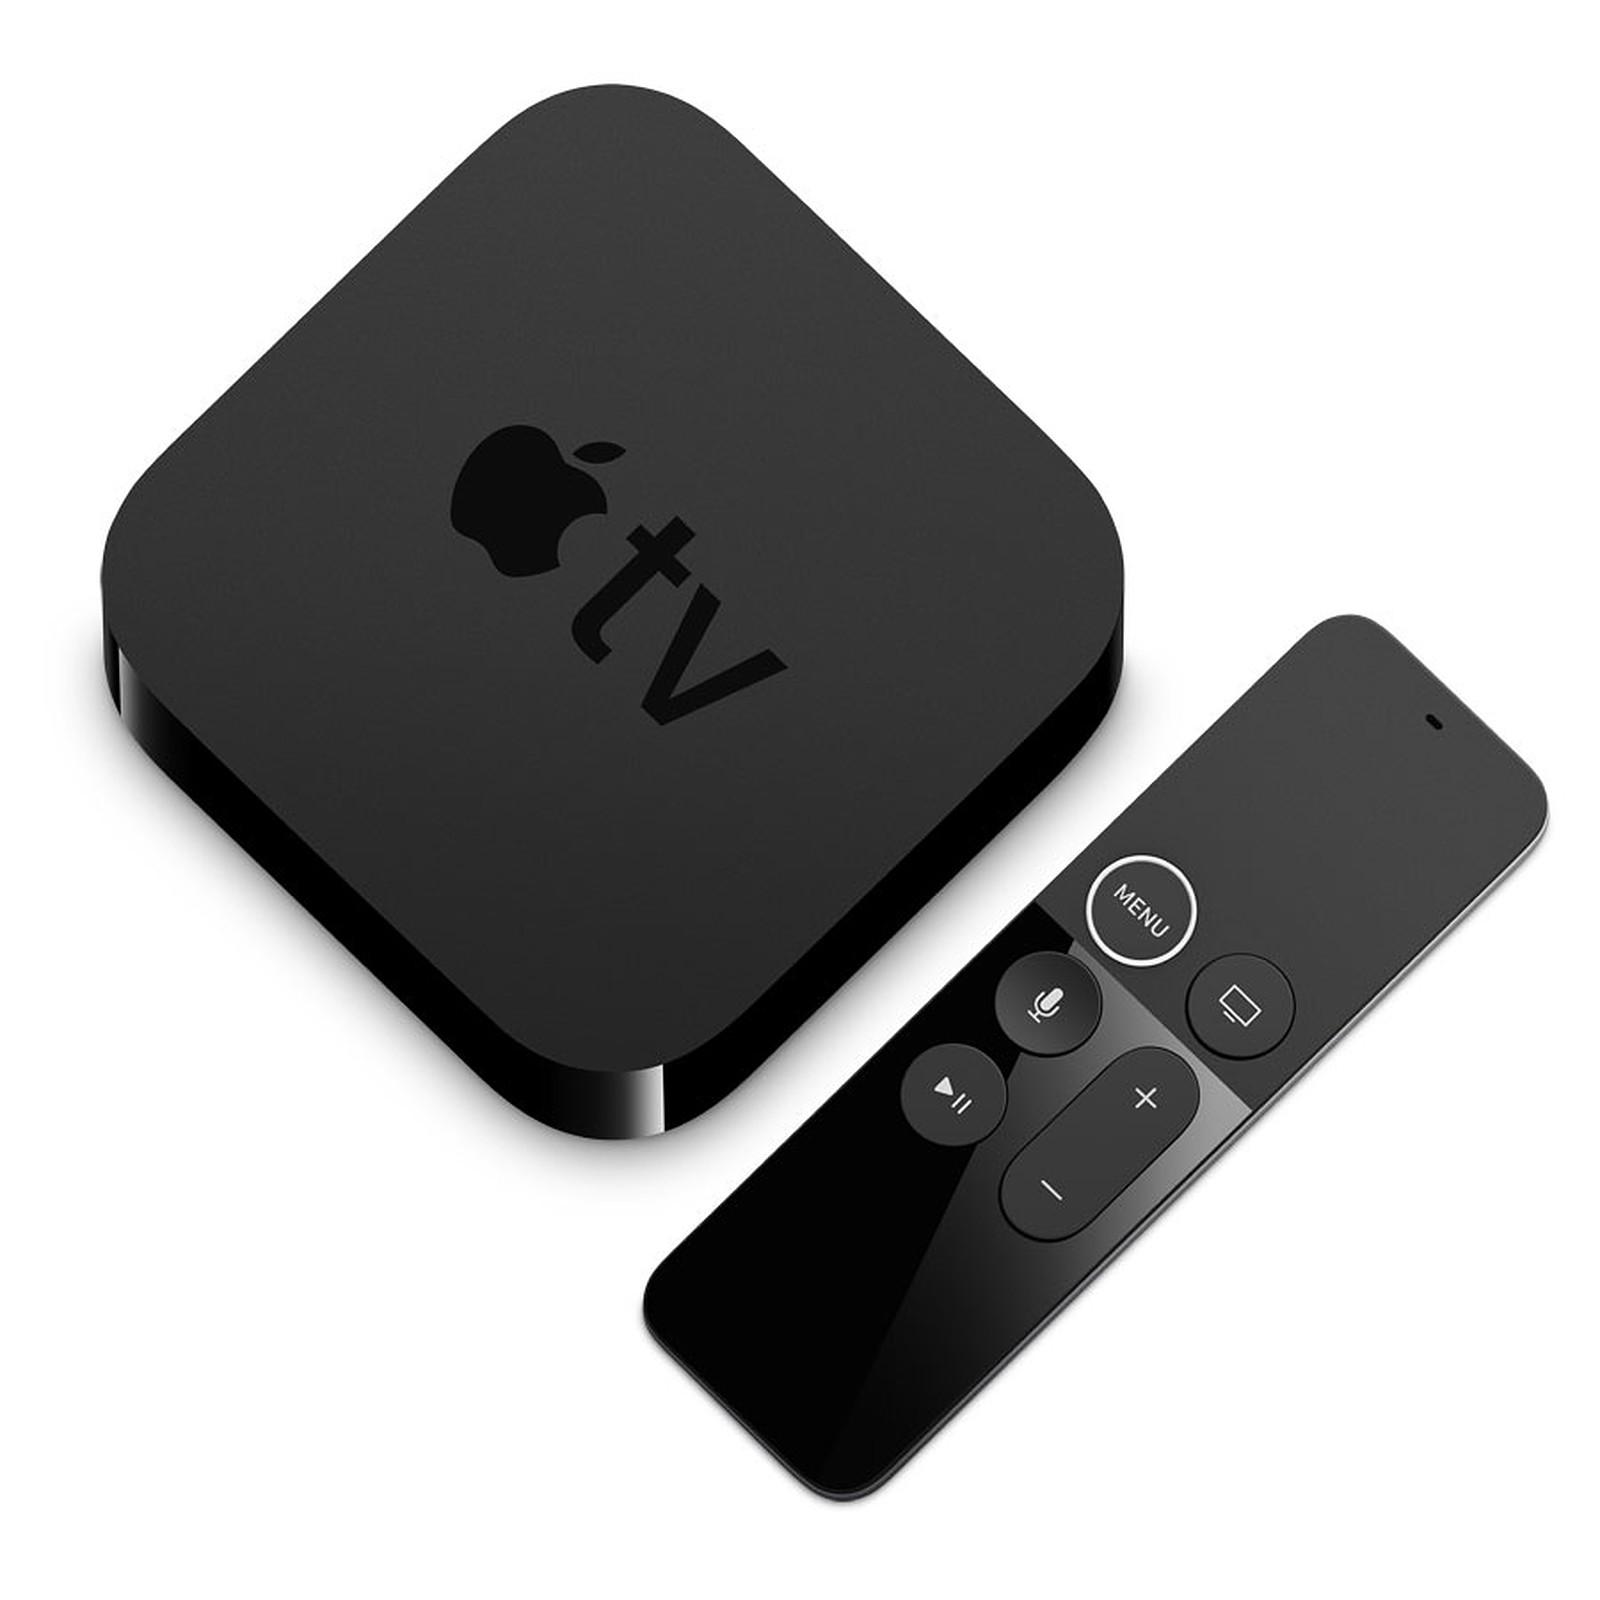 apple tv 4k 32 go mqd22fd a lecteur multim dia apple sur. Black Bedroom Furniture Sets. Home Design Ideas